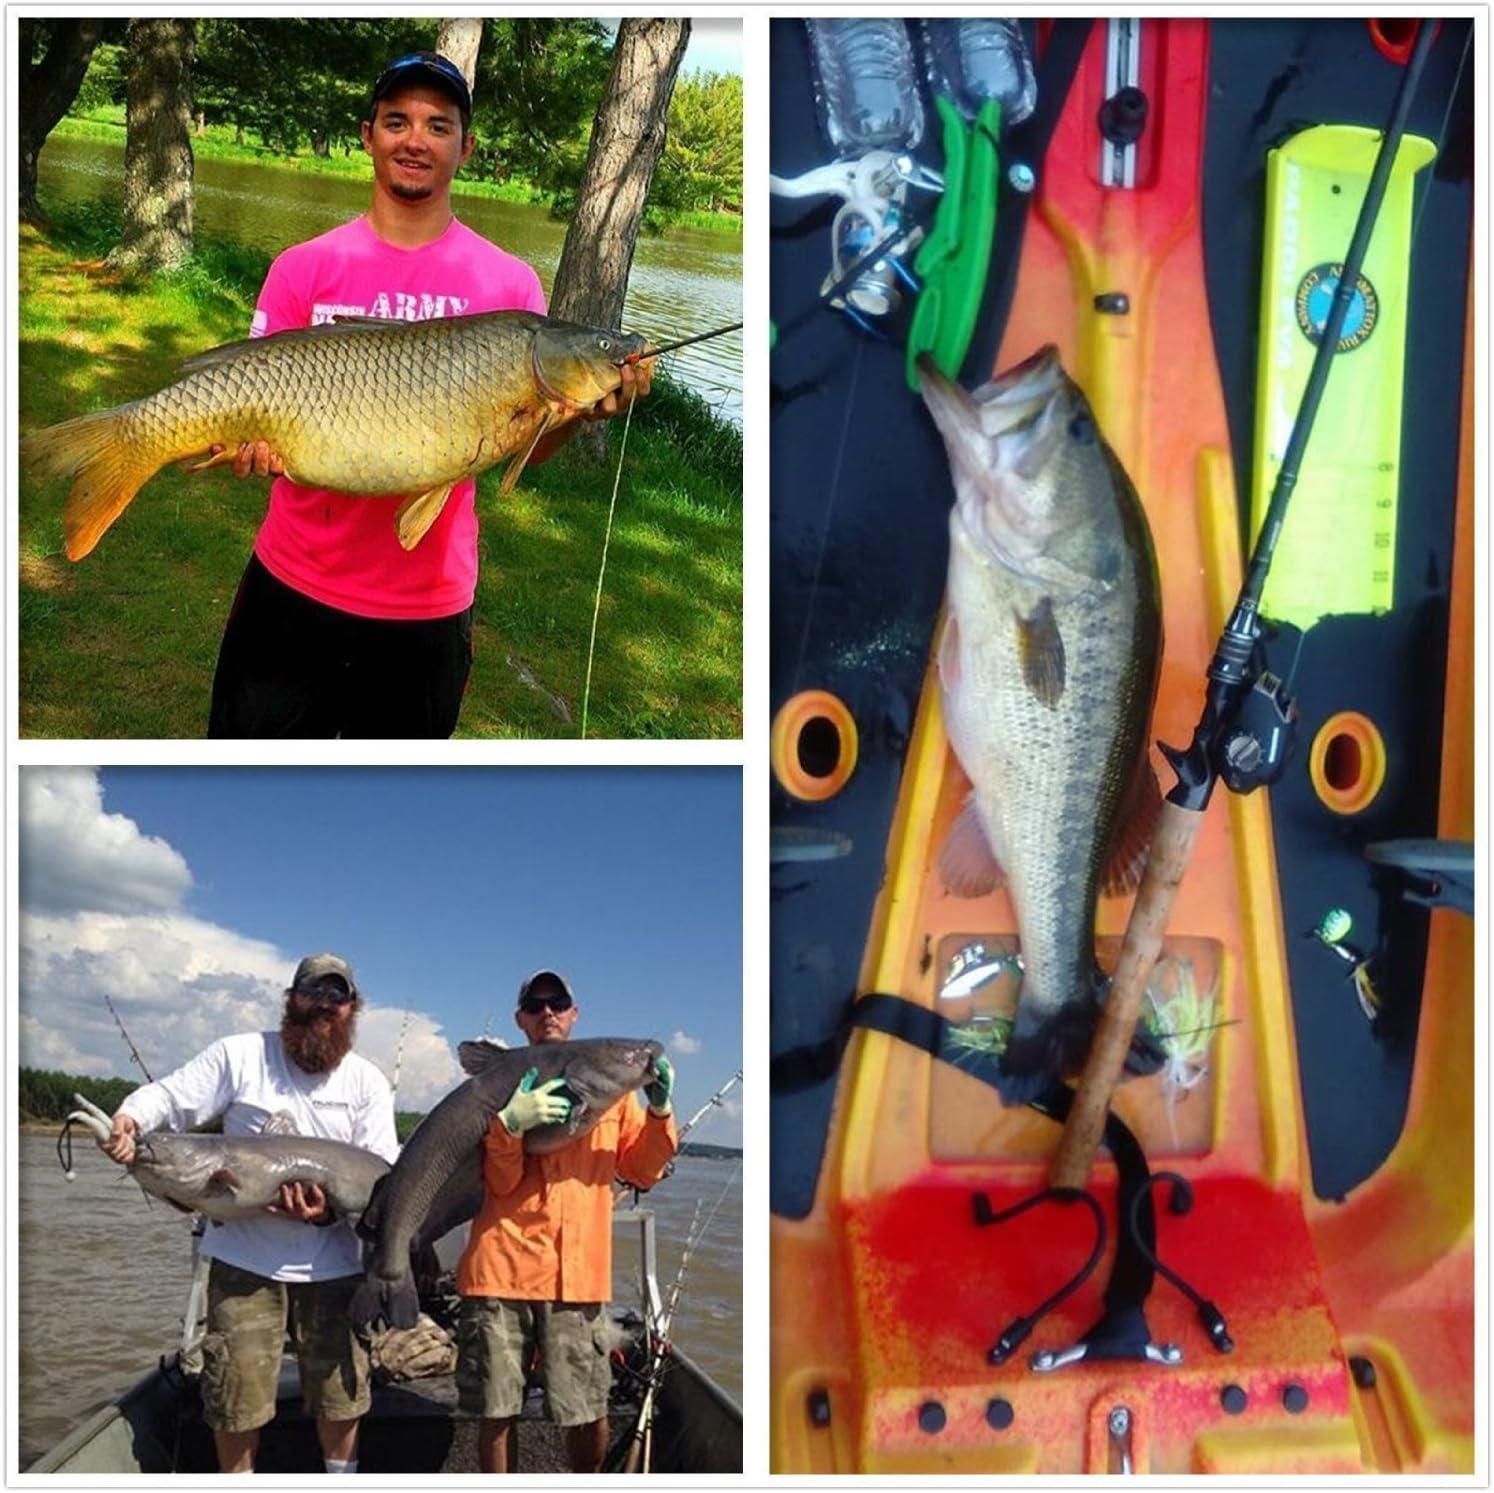 KastKing Fluorokote Fluorocarbon Coated Line 300Yds 4-30 lbs Fishing Line